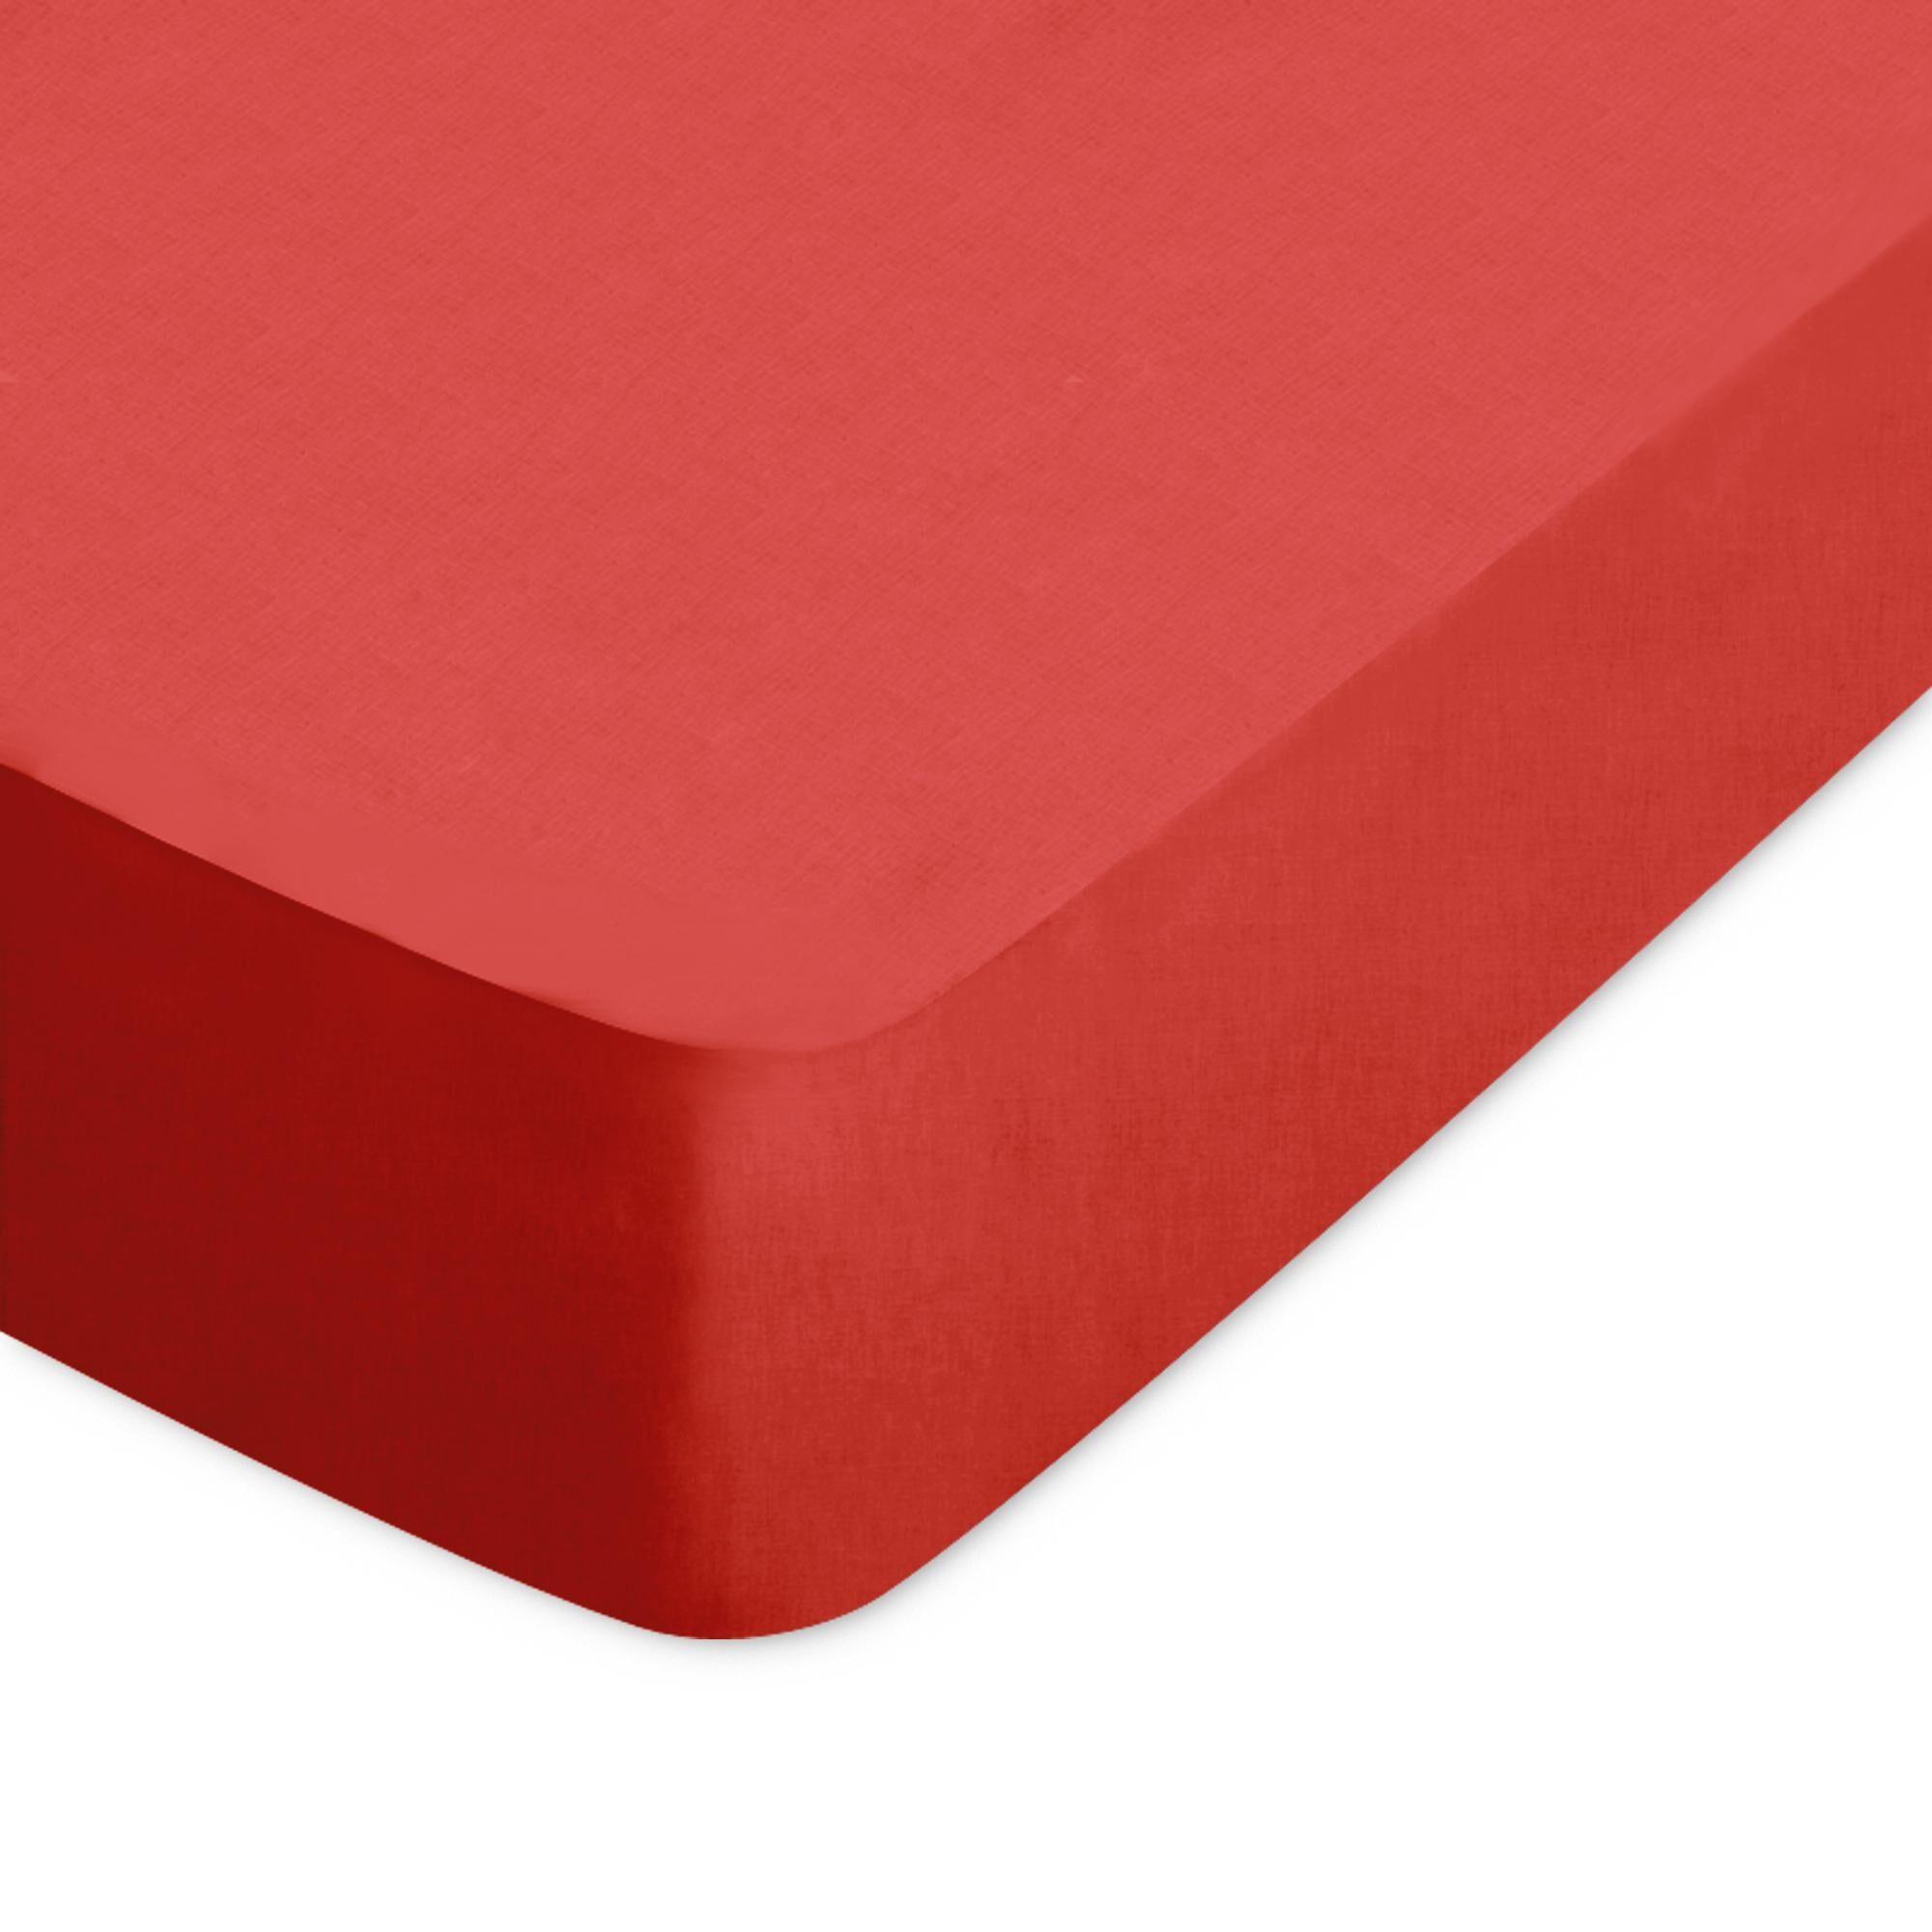 Linnea Drap housse uni 80x210 cm 100% coton ALTO orange Baie de Goji